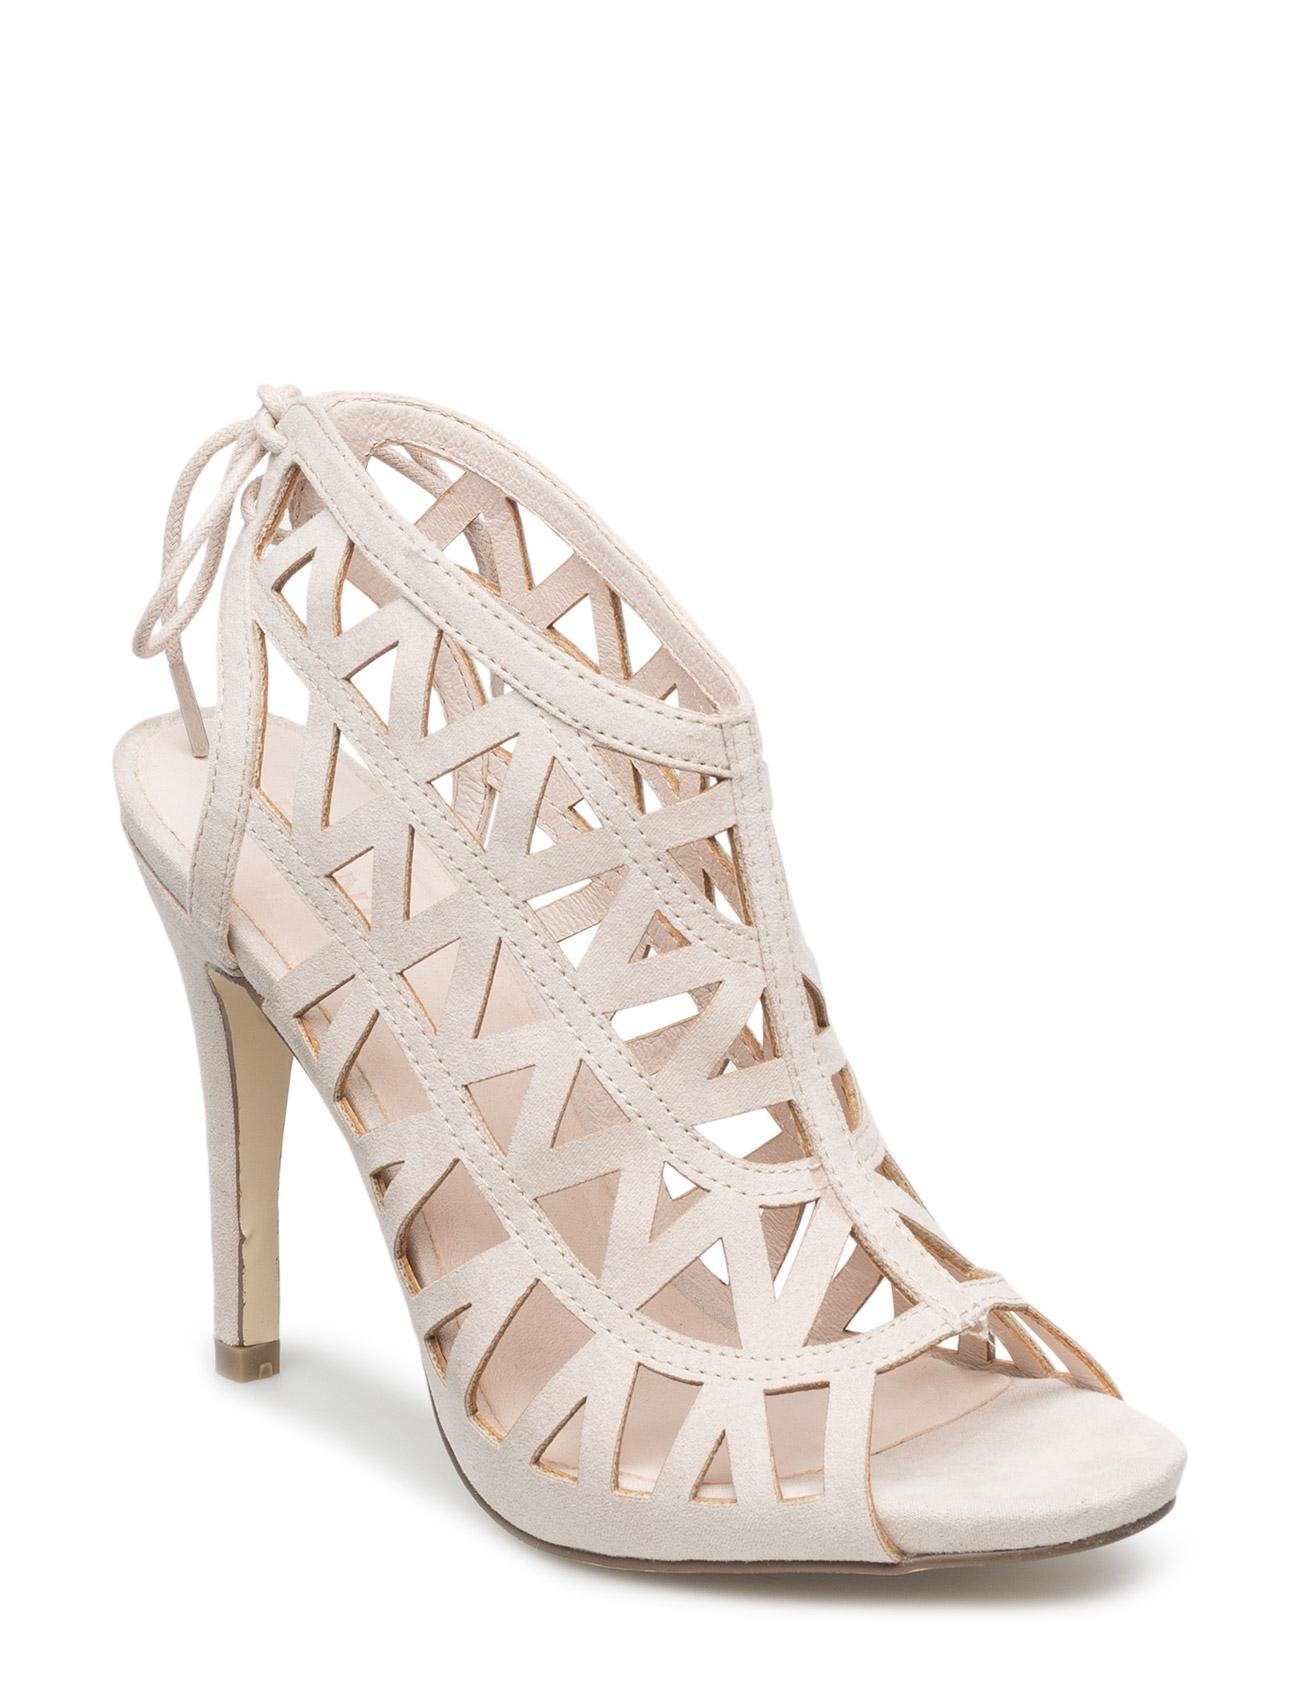 Cutout Stiletto Sandal Jja16 Bianco Sandaler til Kvinder i Sort